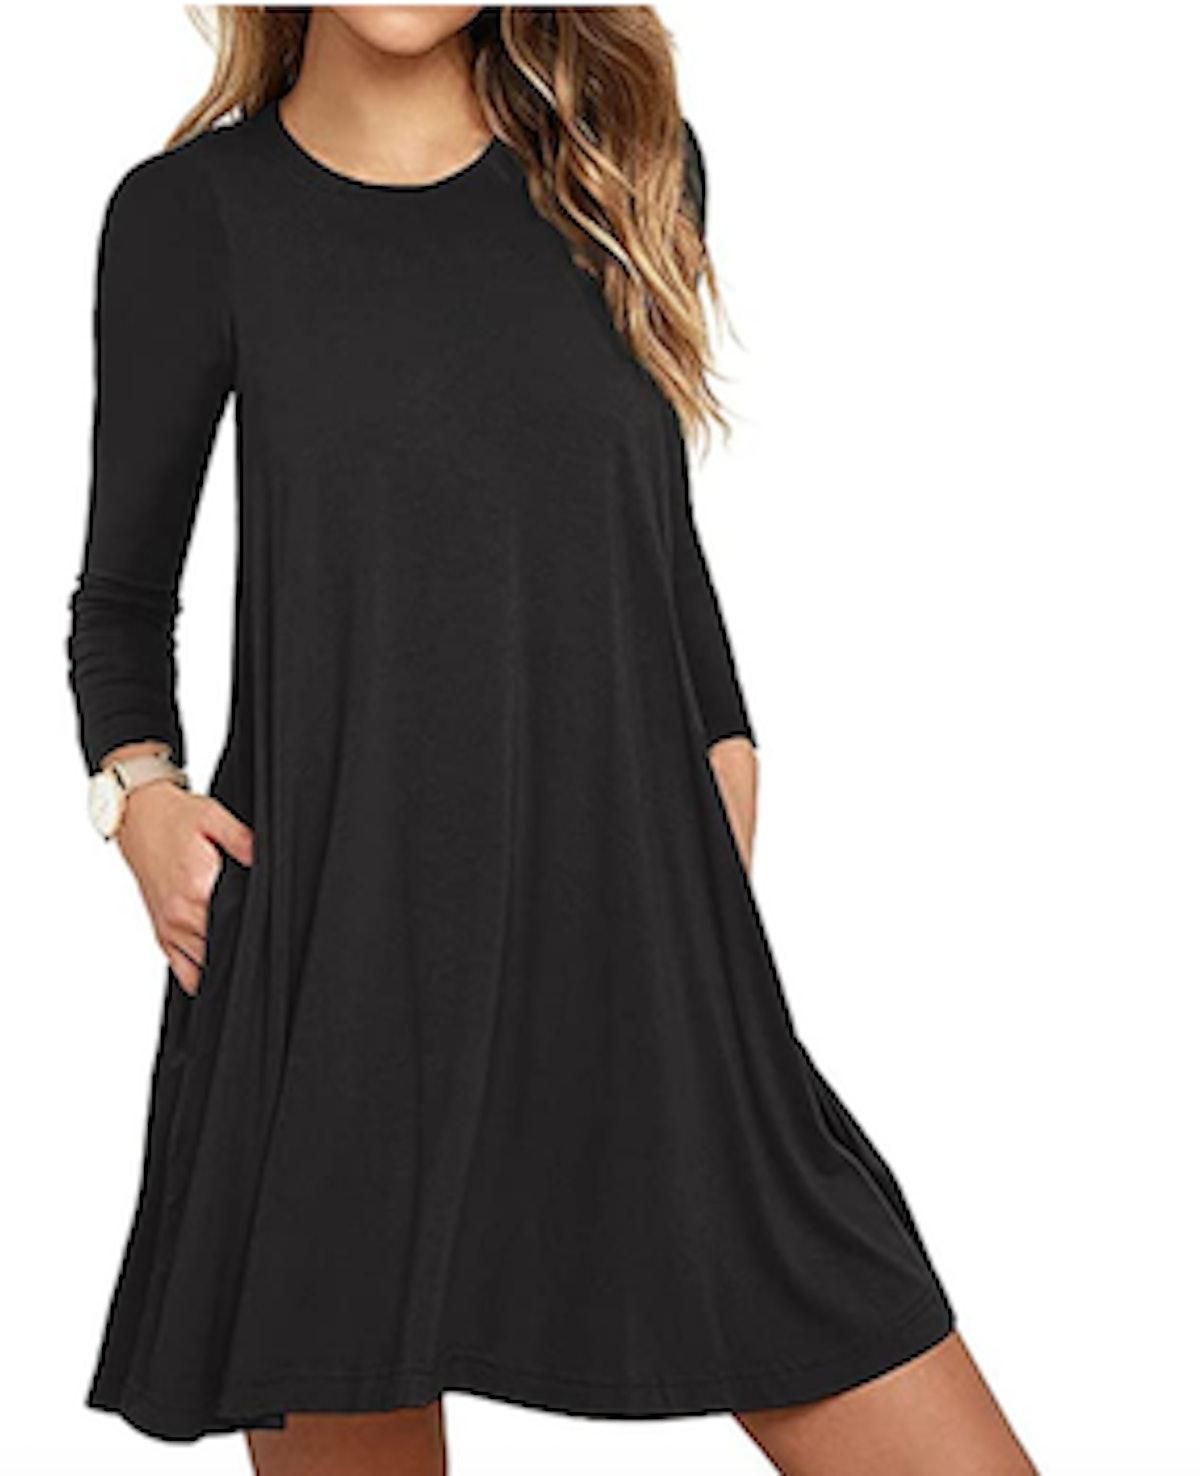 Unbranded Long-Sleeve T-Shirt Dress